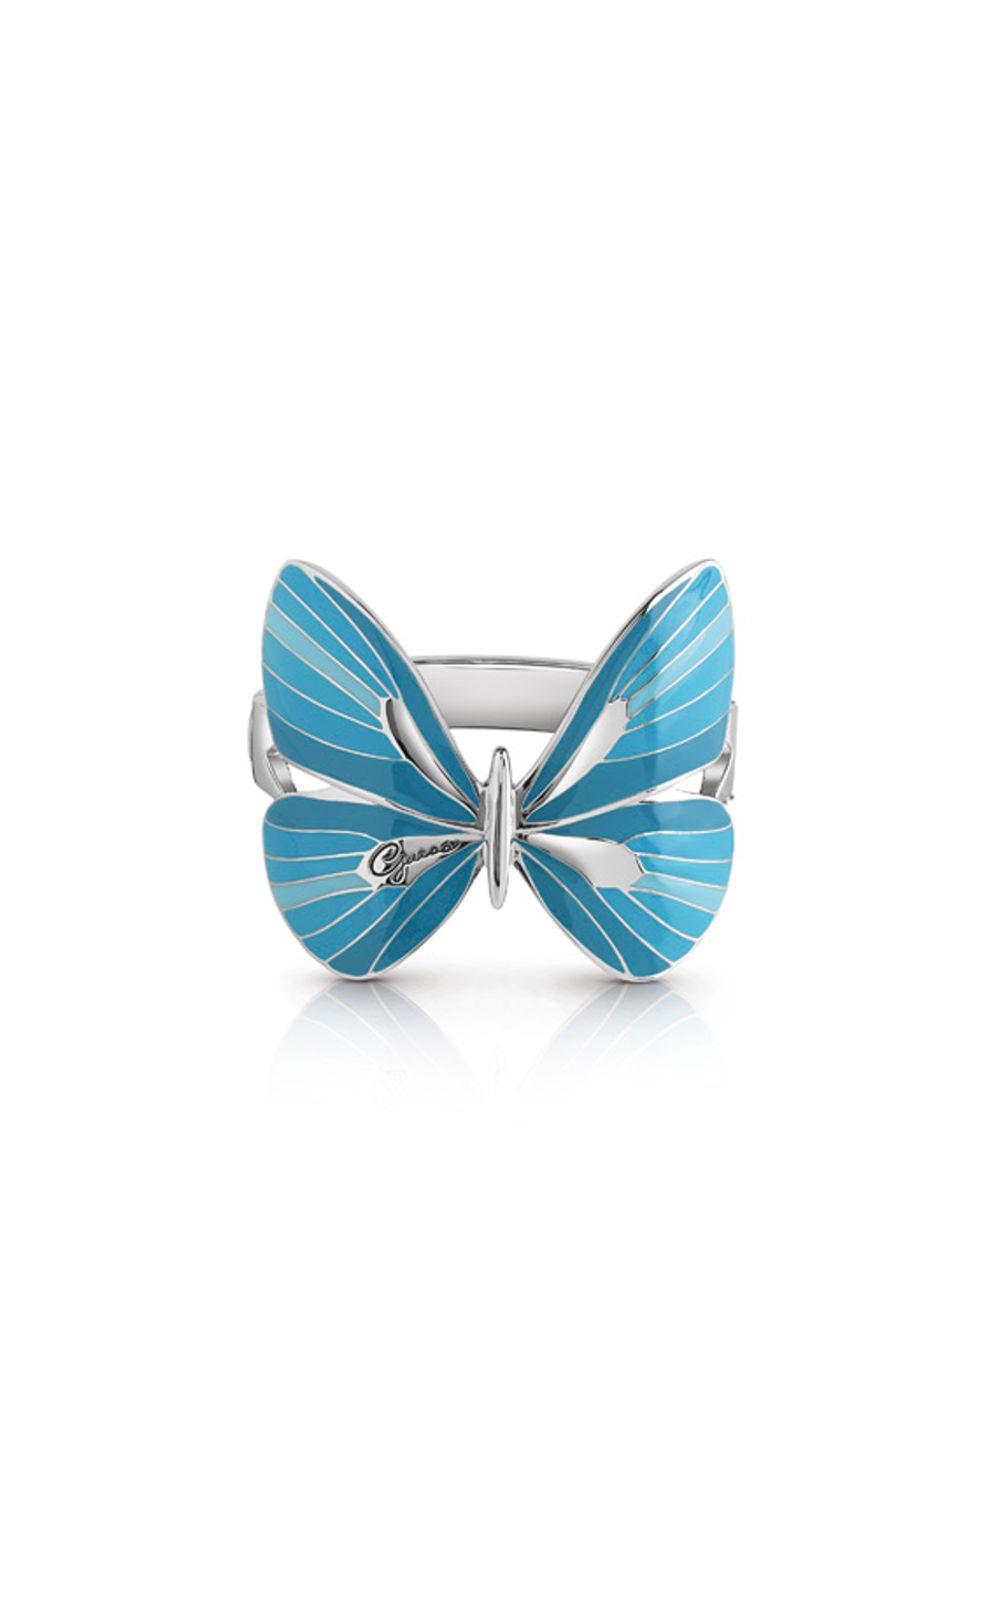 GUESS FAUX UBB85148 Ασημένιο Βραχιόλι Με Γαλάζια Πεταλούδα